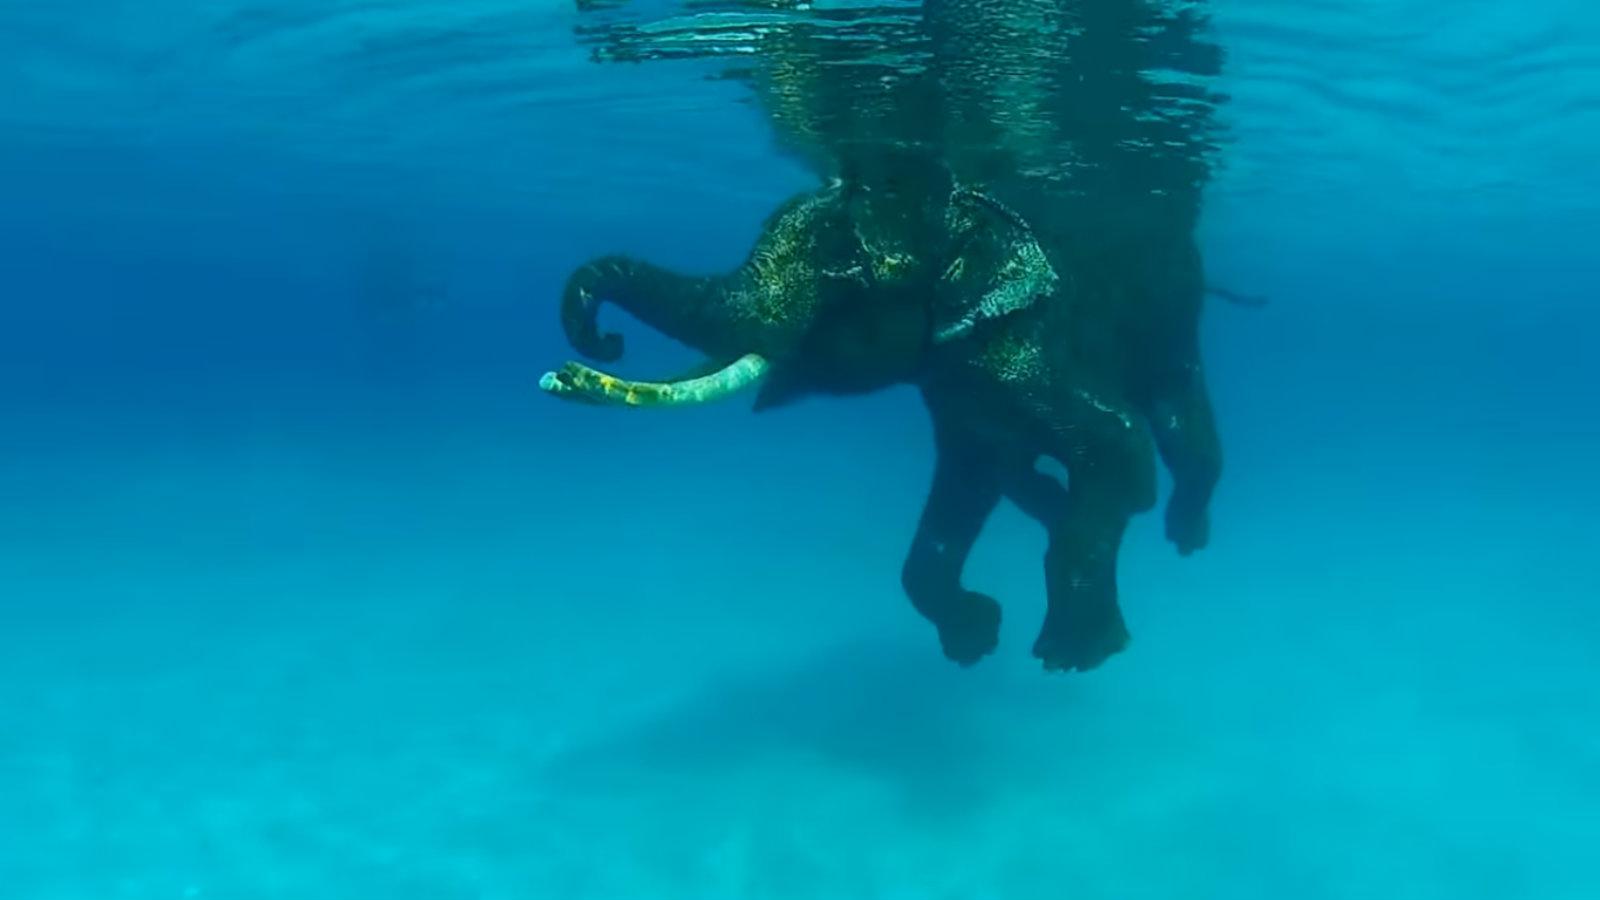 Rajan in his stride under the sea.